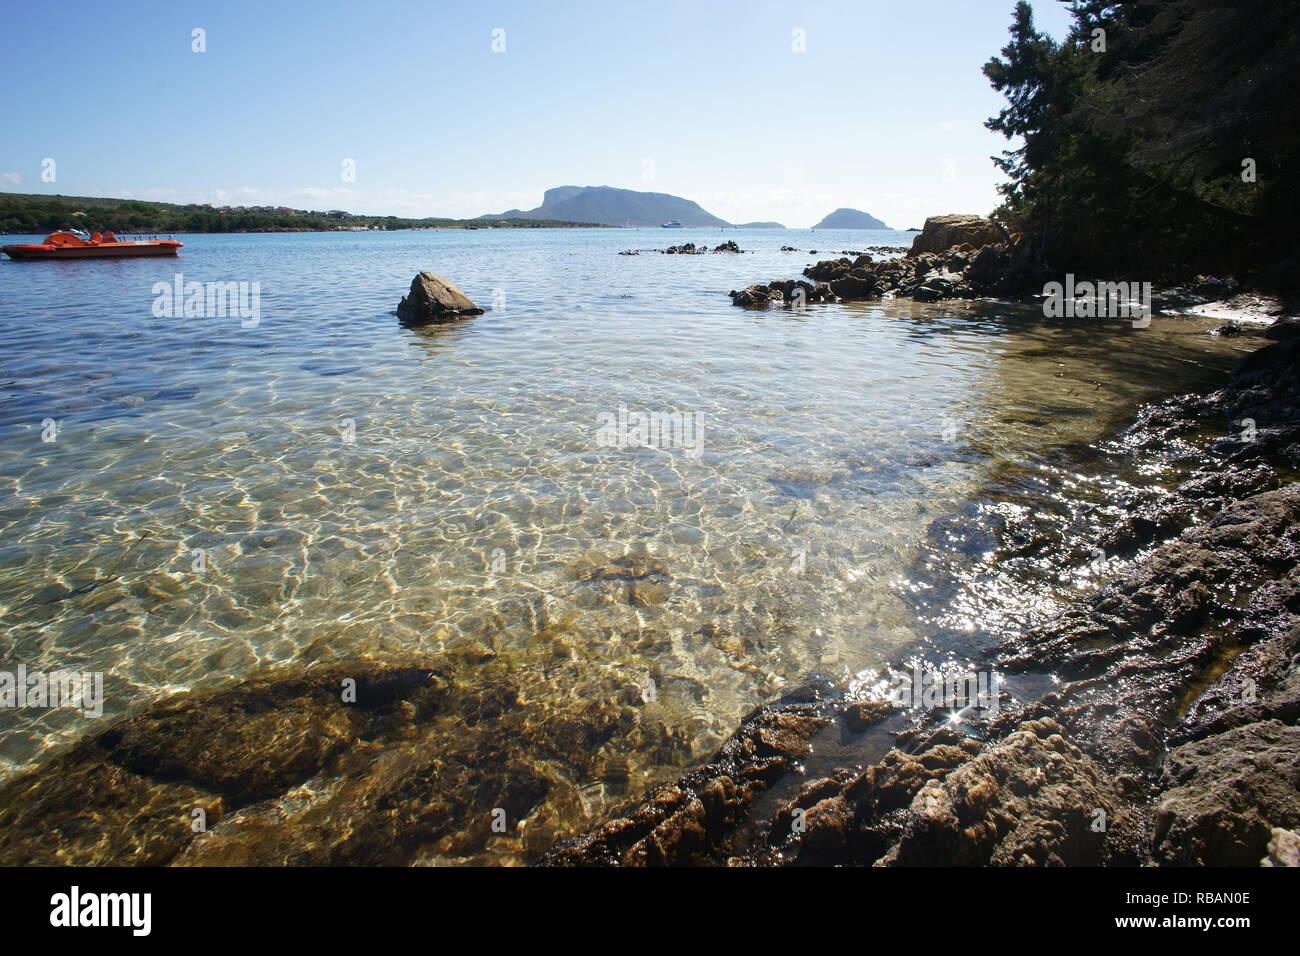 Cala Sassari beach in Marinella bay, golfo aranci, Olbia, sardinia, italy - Stock Image